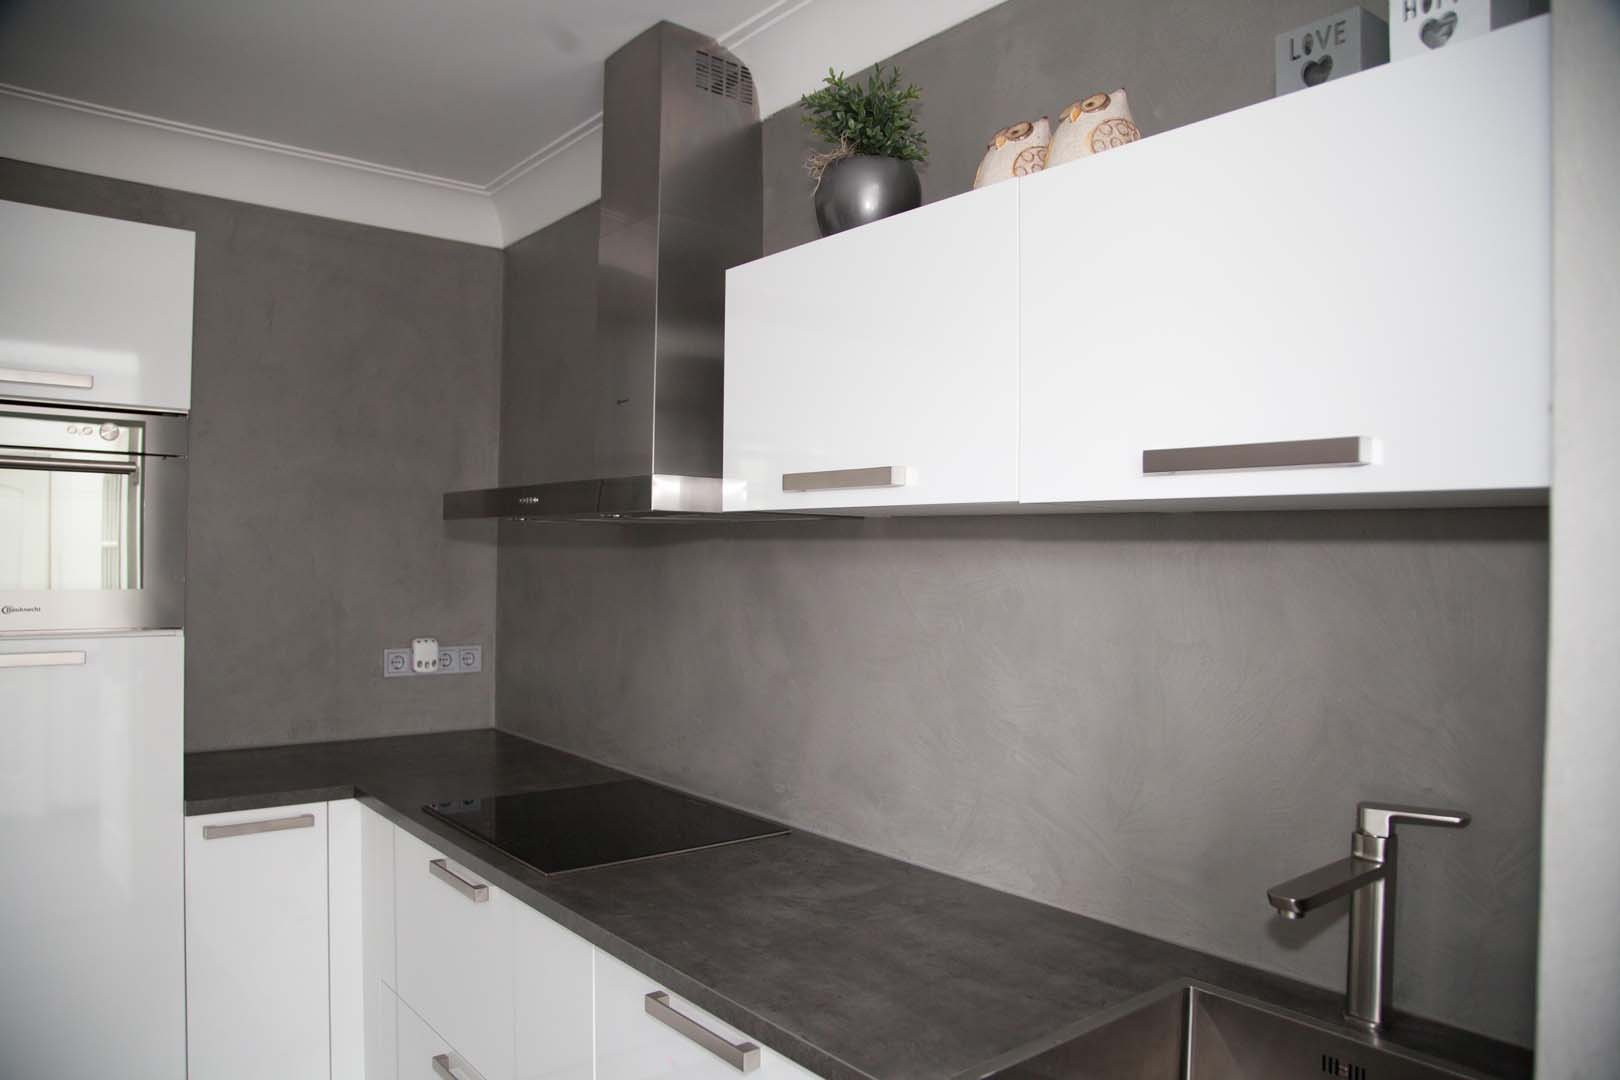 Van der looy achterwand keuken in betonlook - Keuken uitgerust m ...